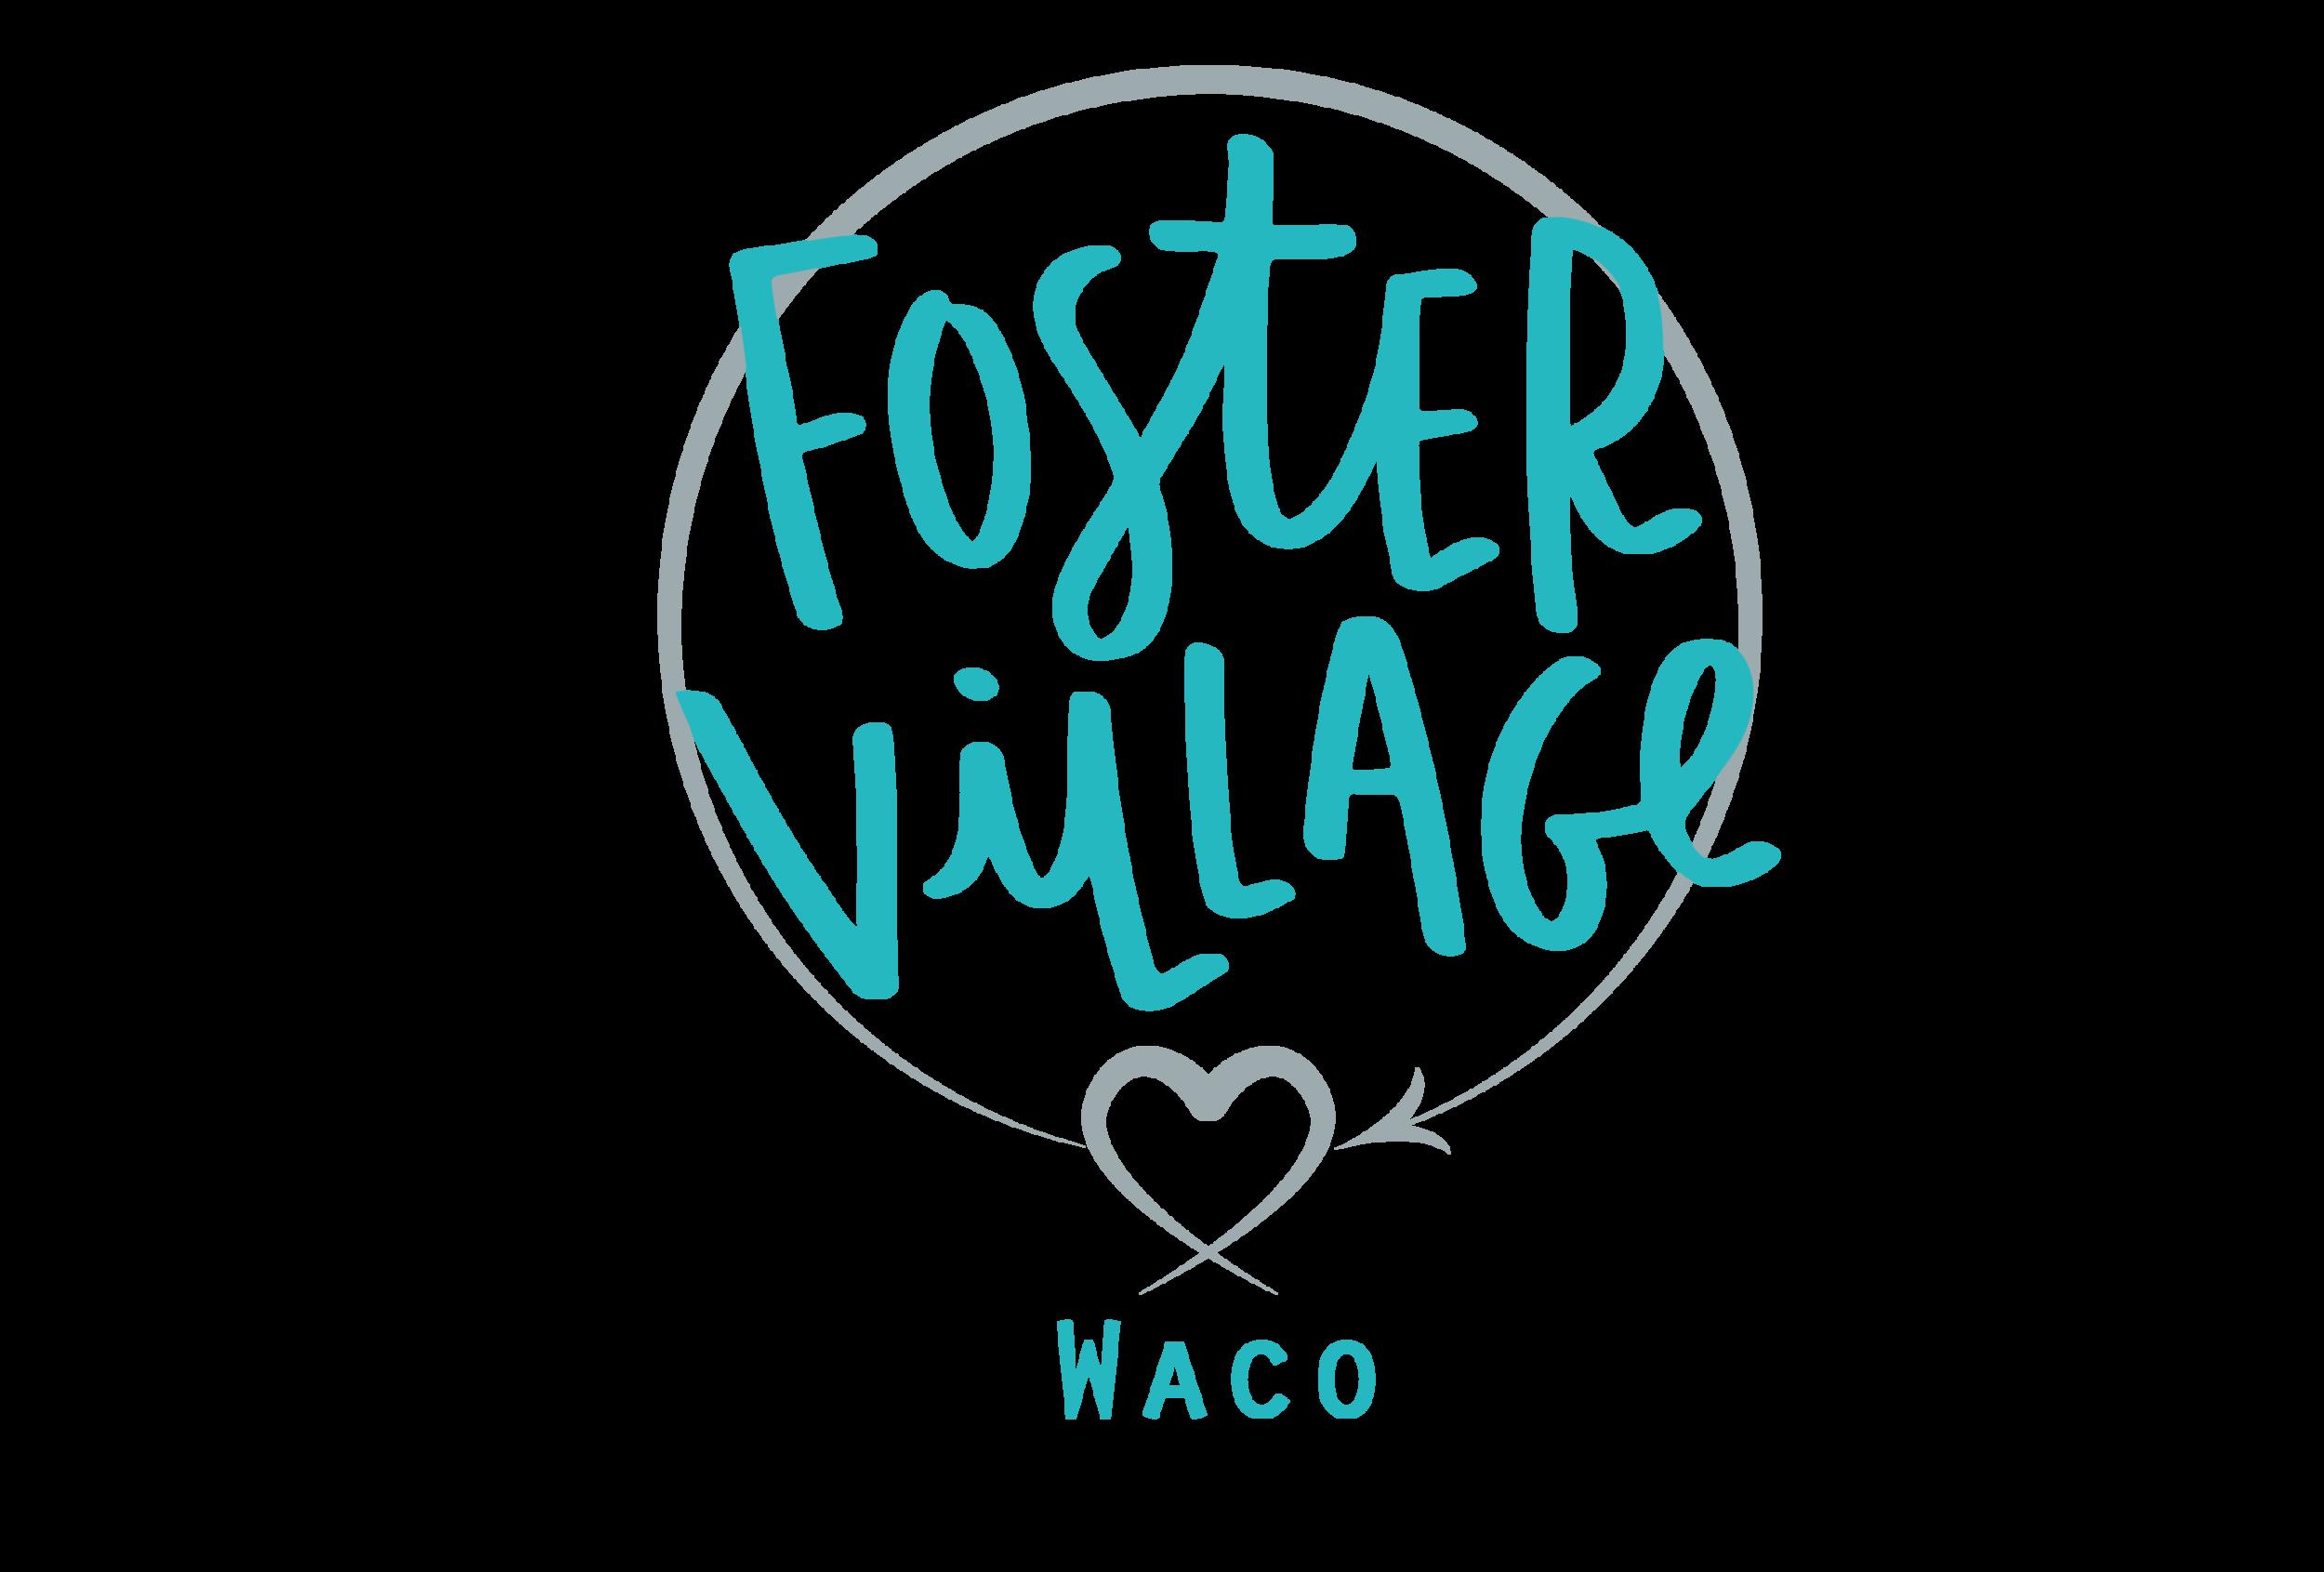 FV_Waco_logo.png